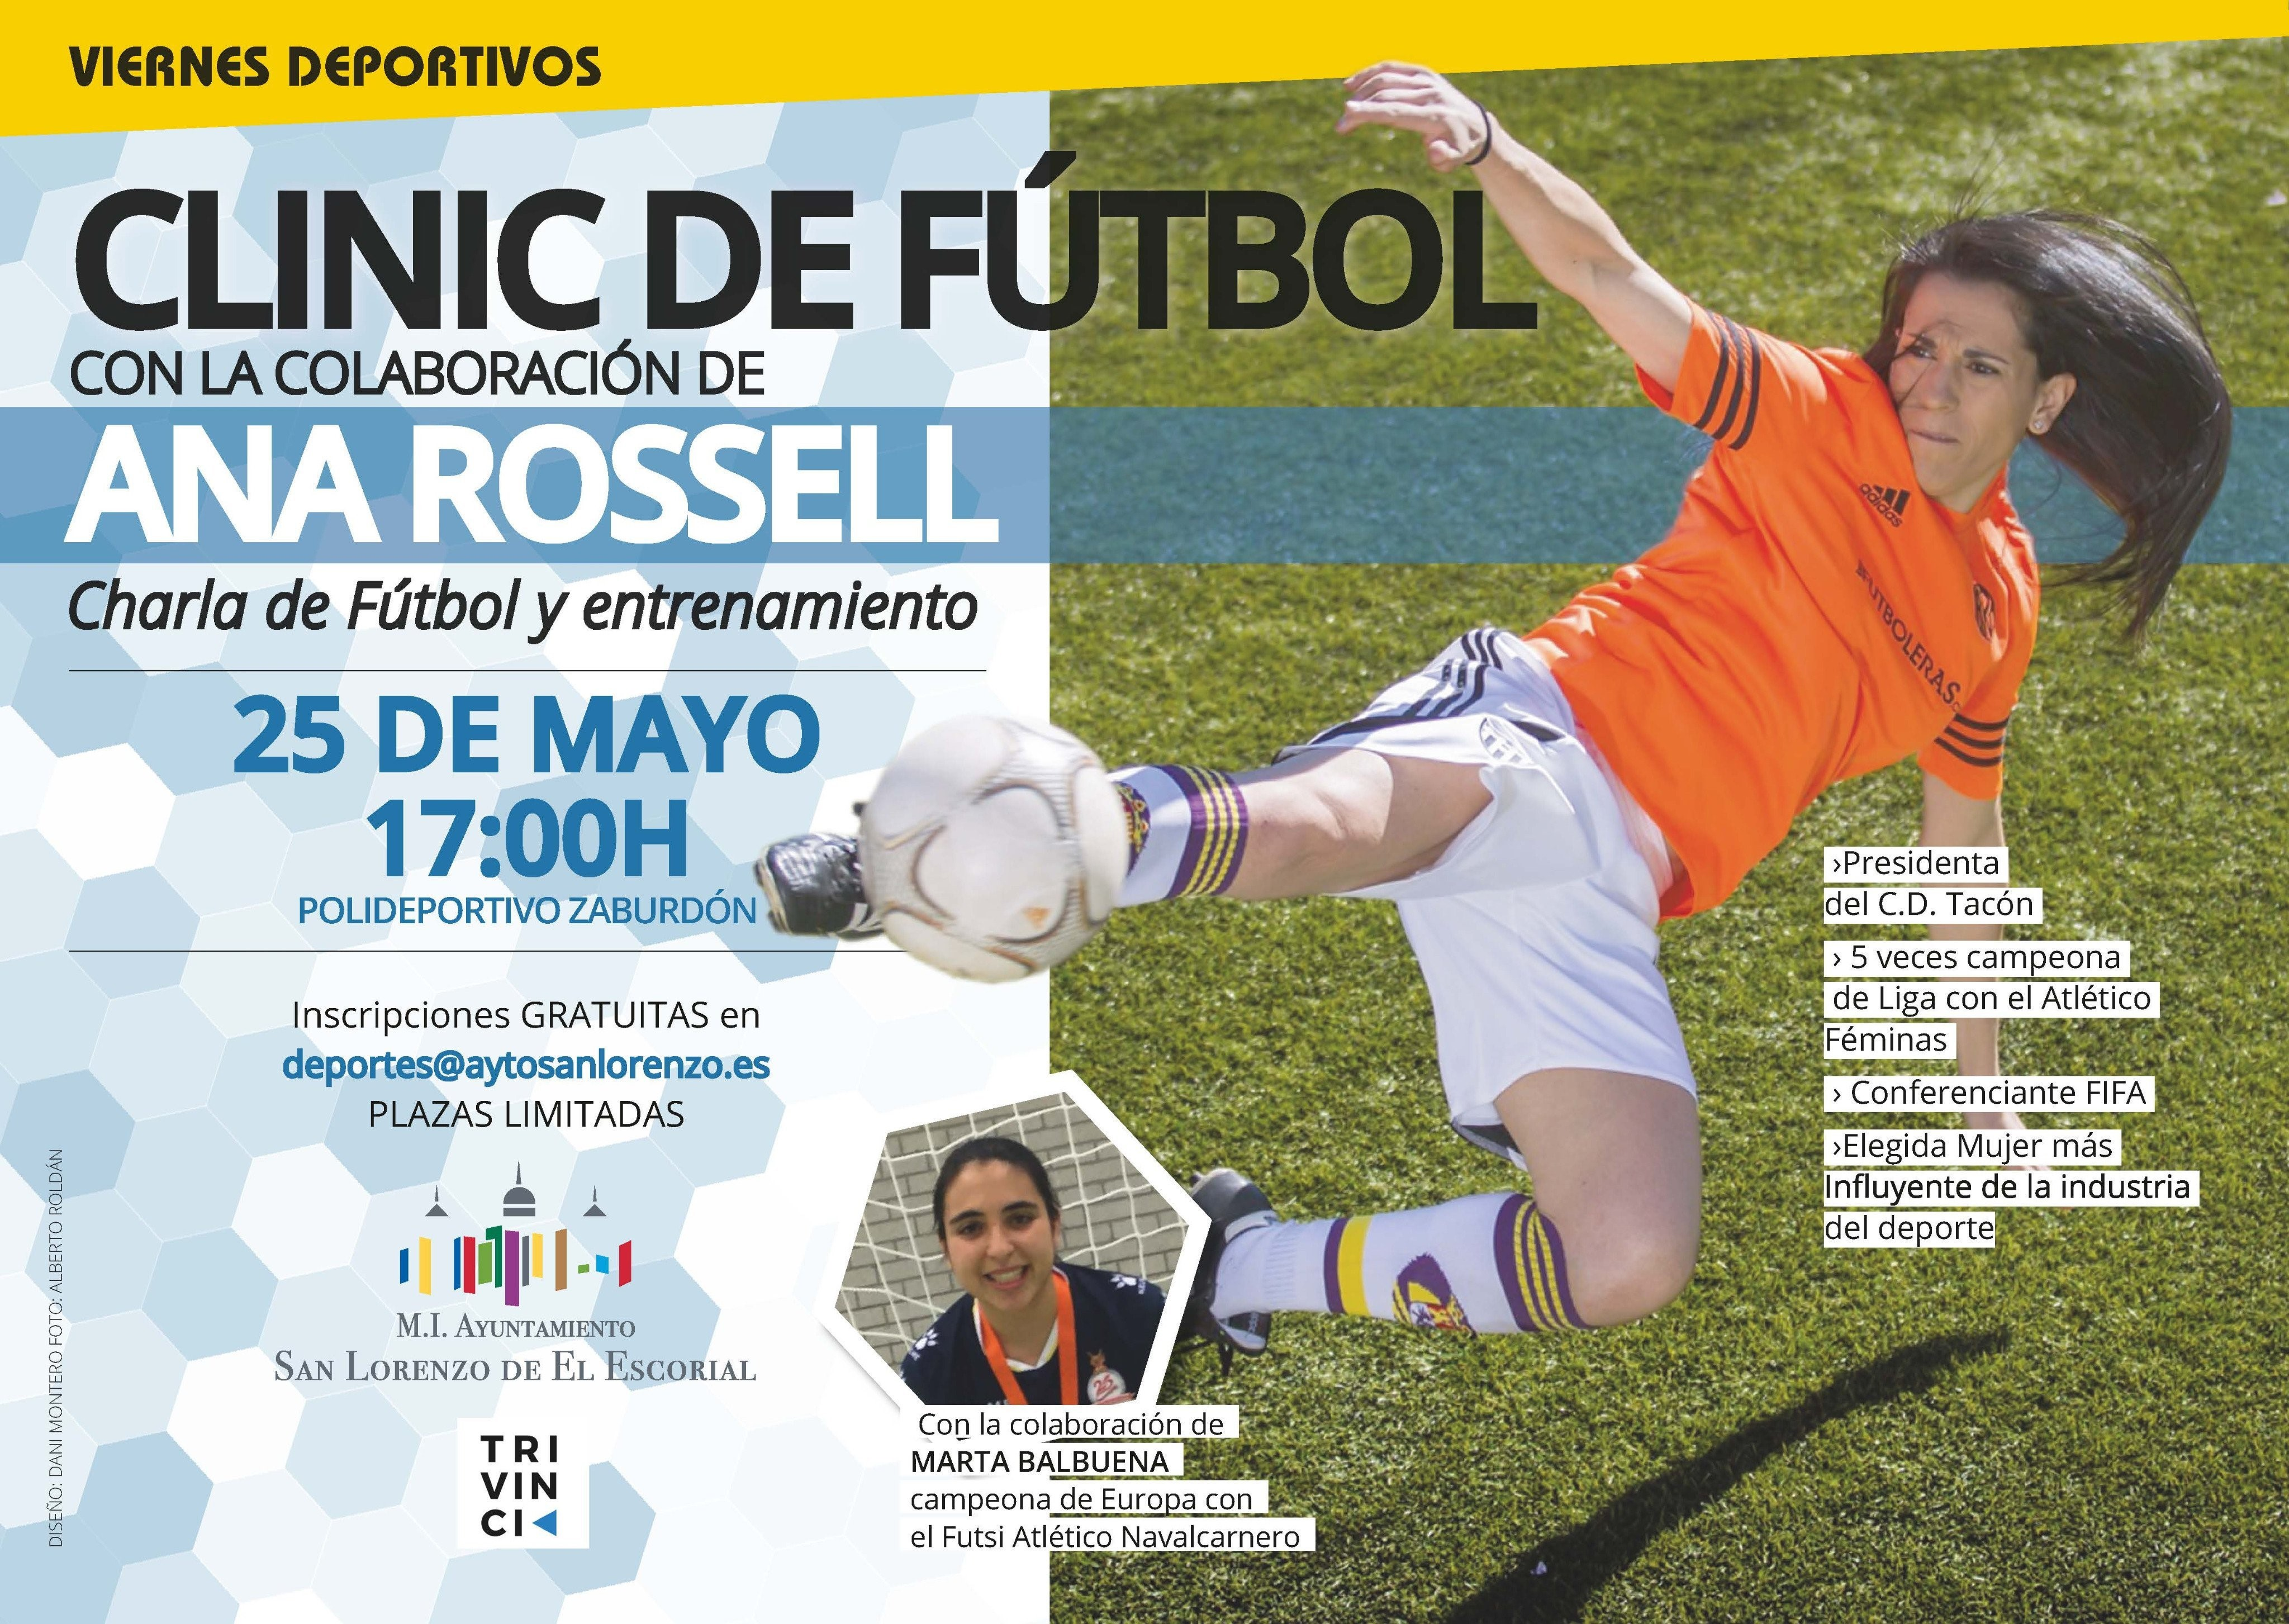 rossell